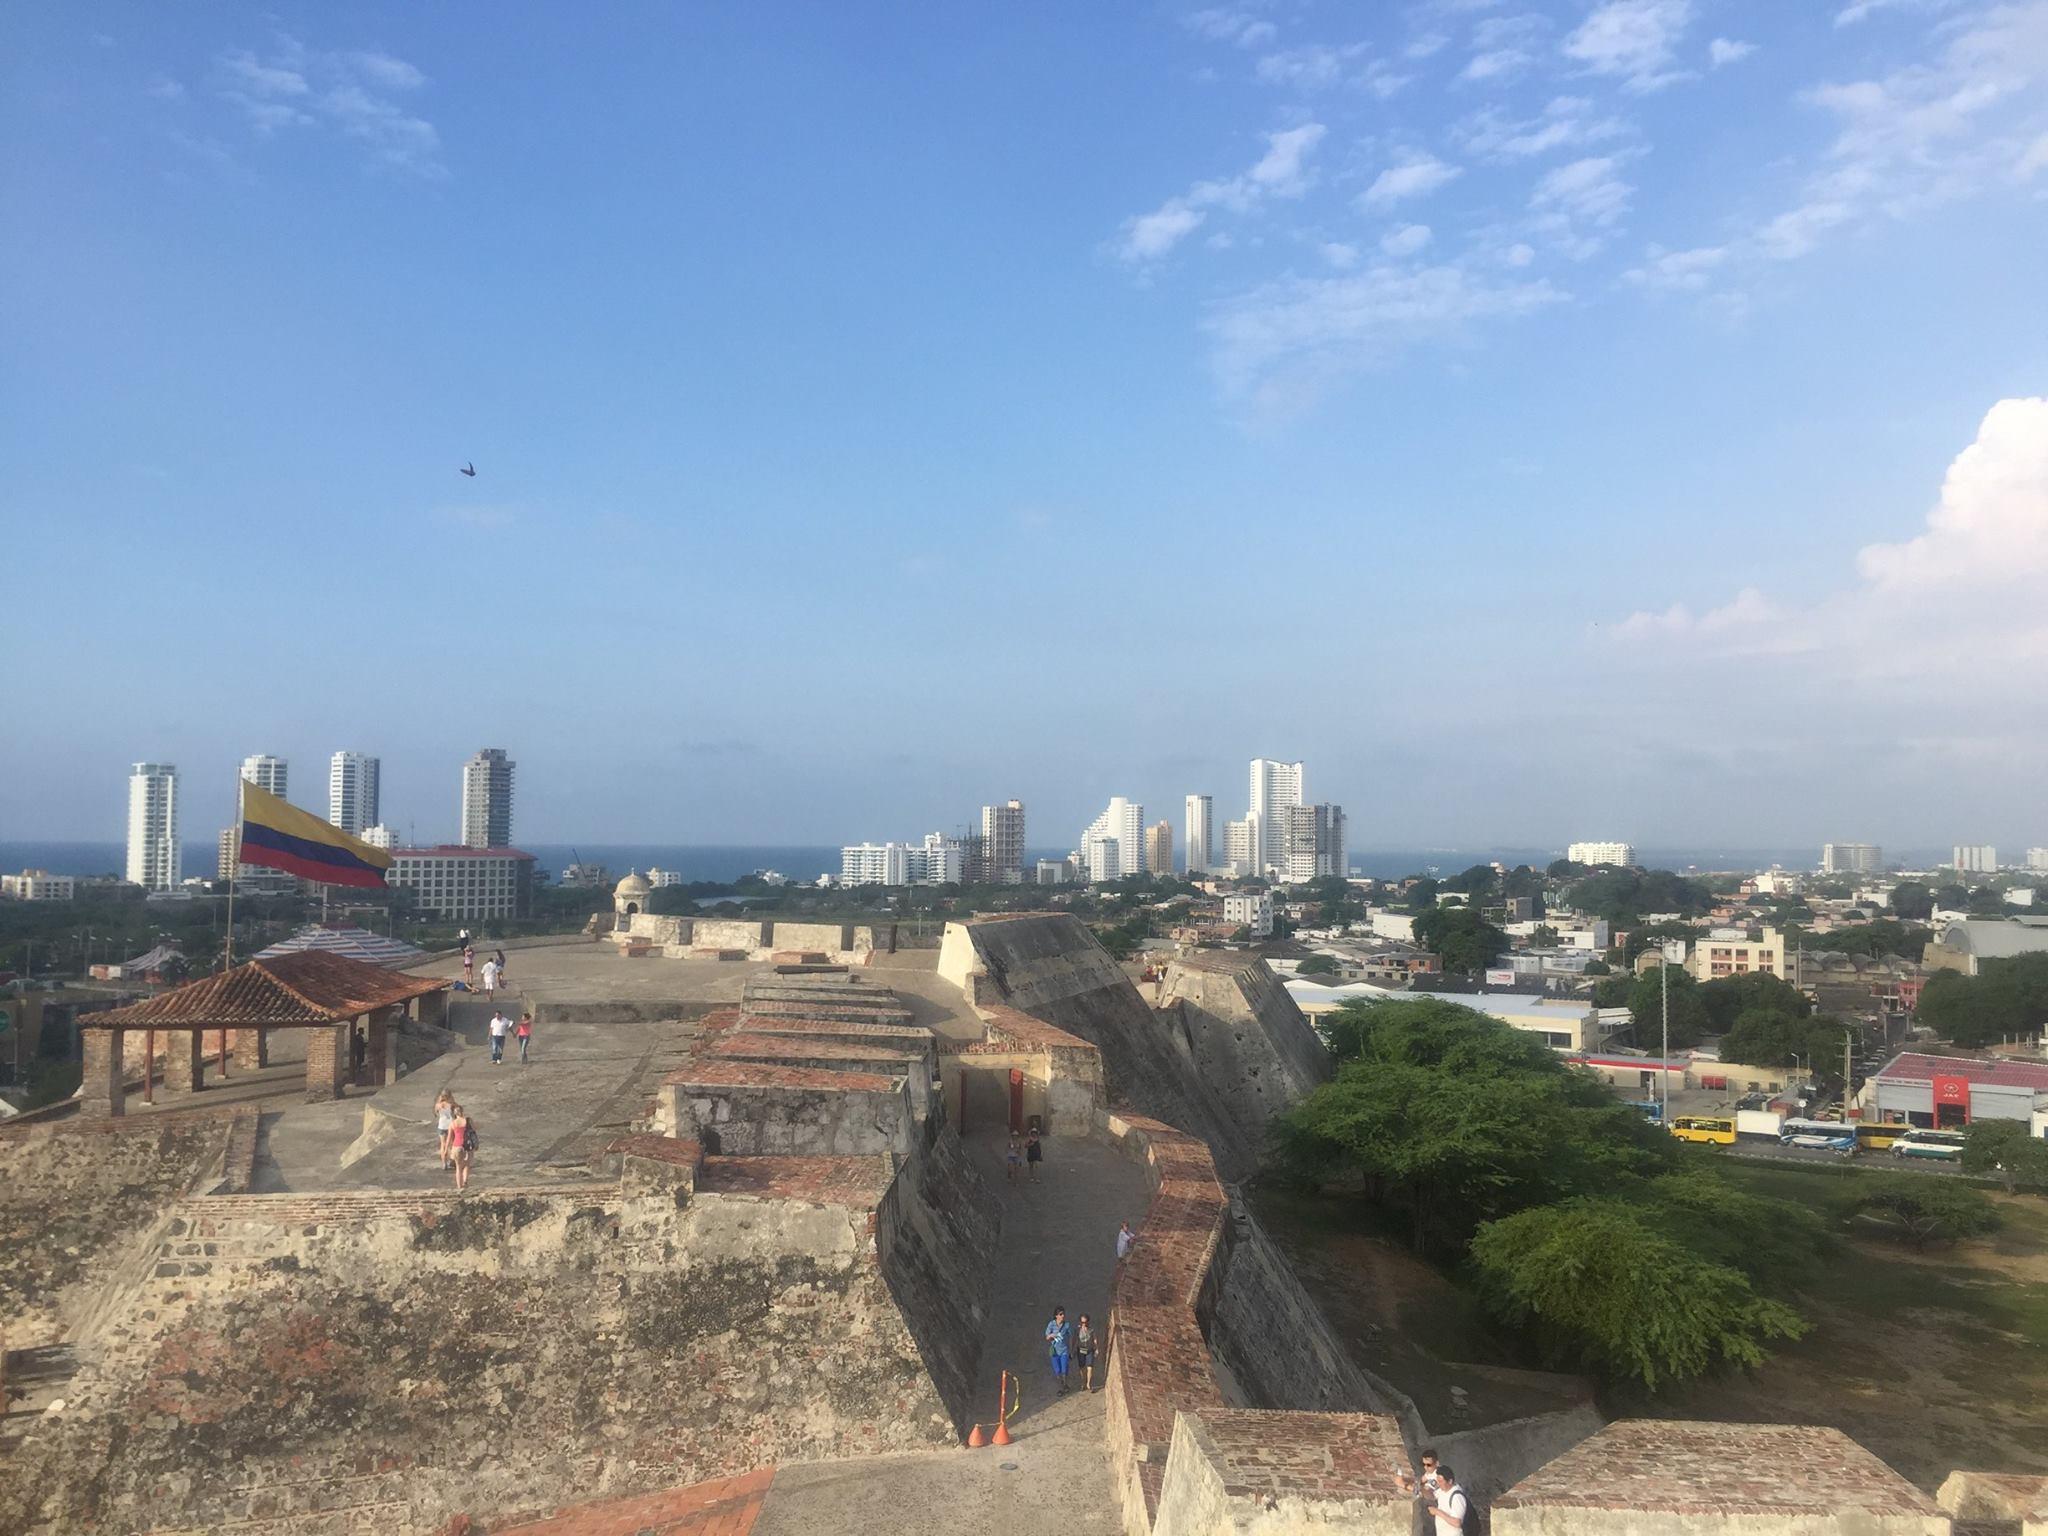 View from Cartagena's historic   Castillo San Felipe de Barajas  , a UNESCO World Heritage Site that dates back to 1536.